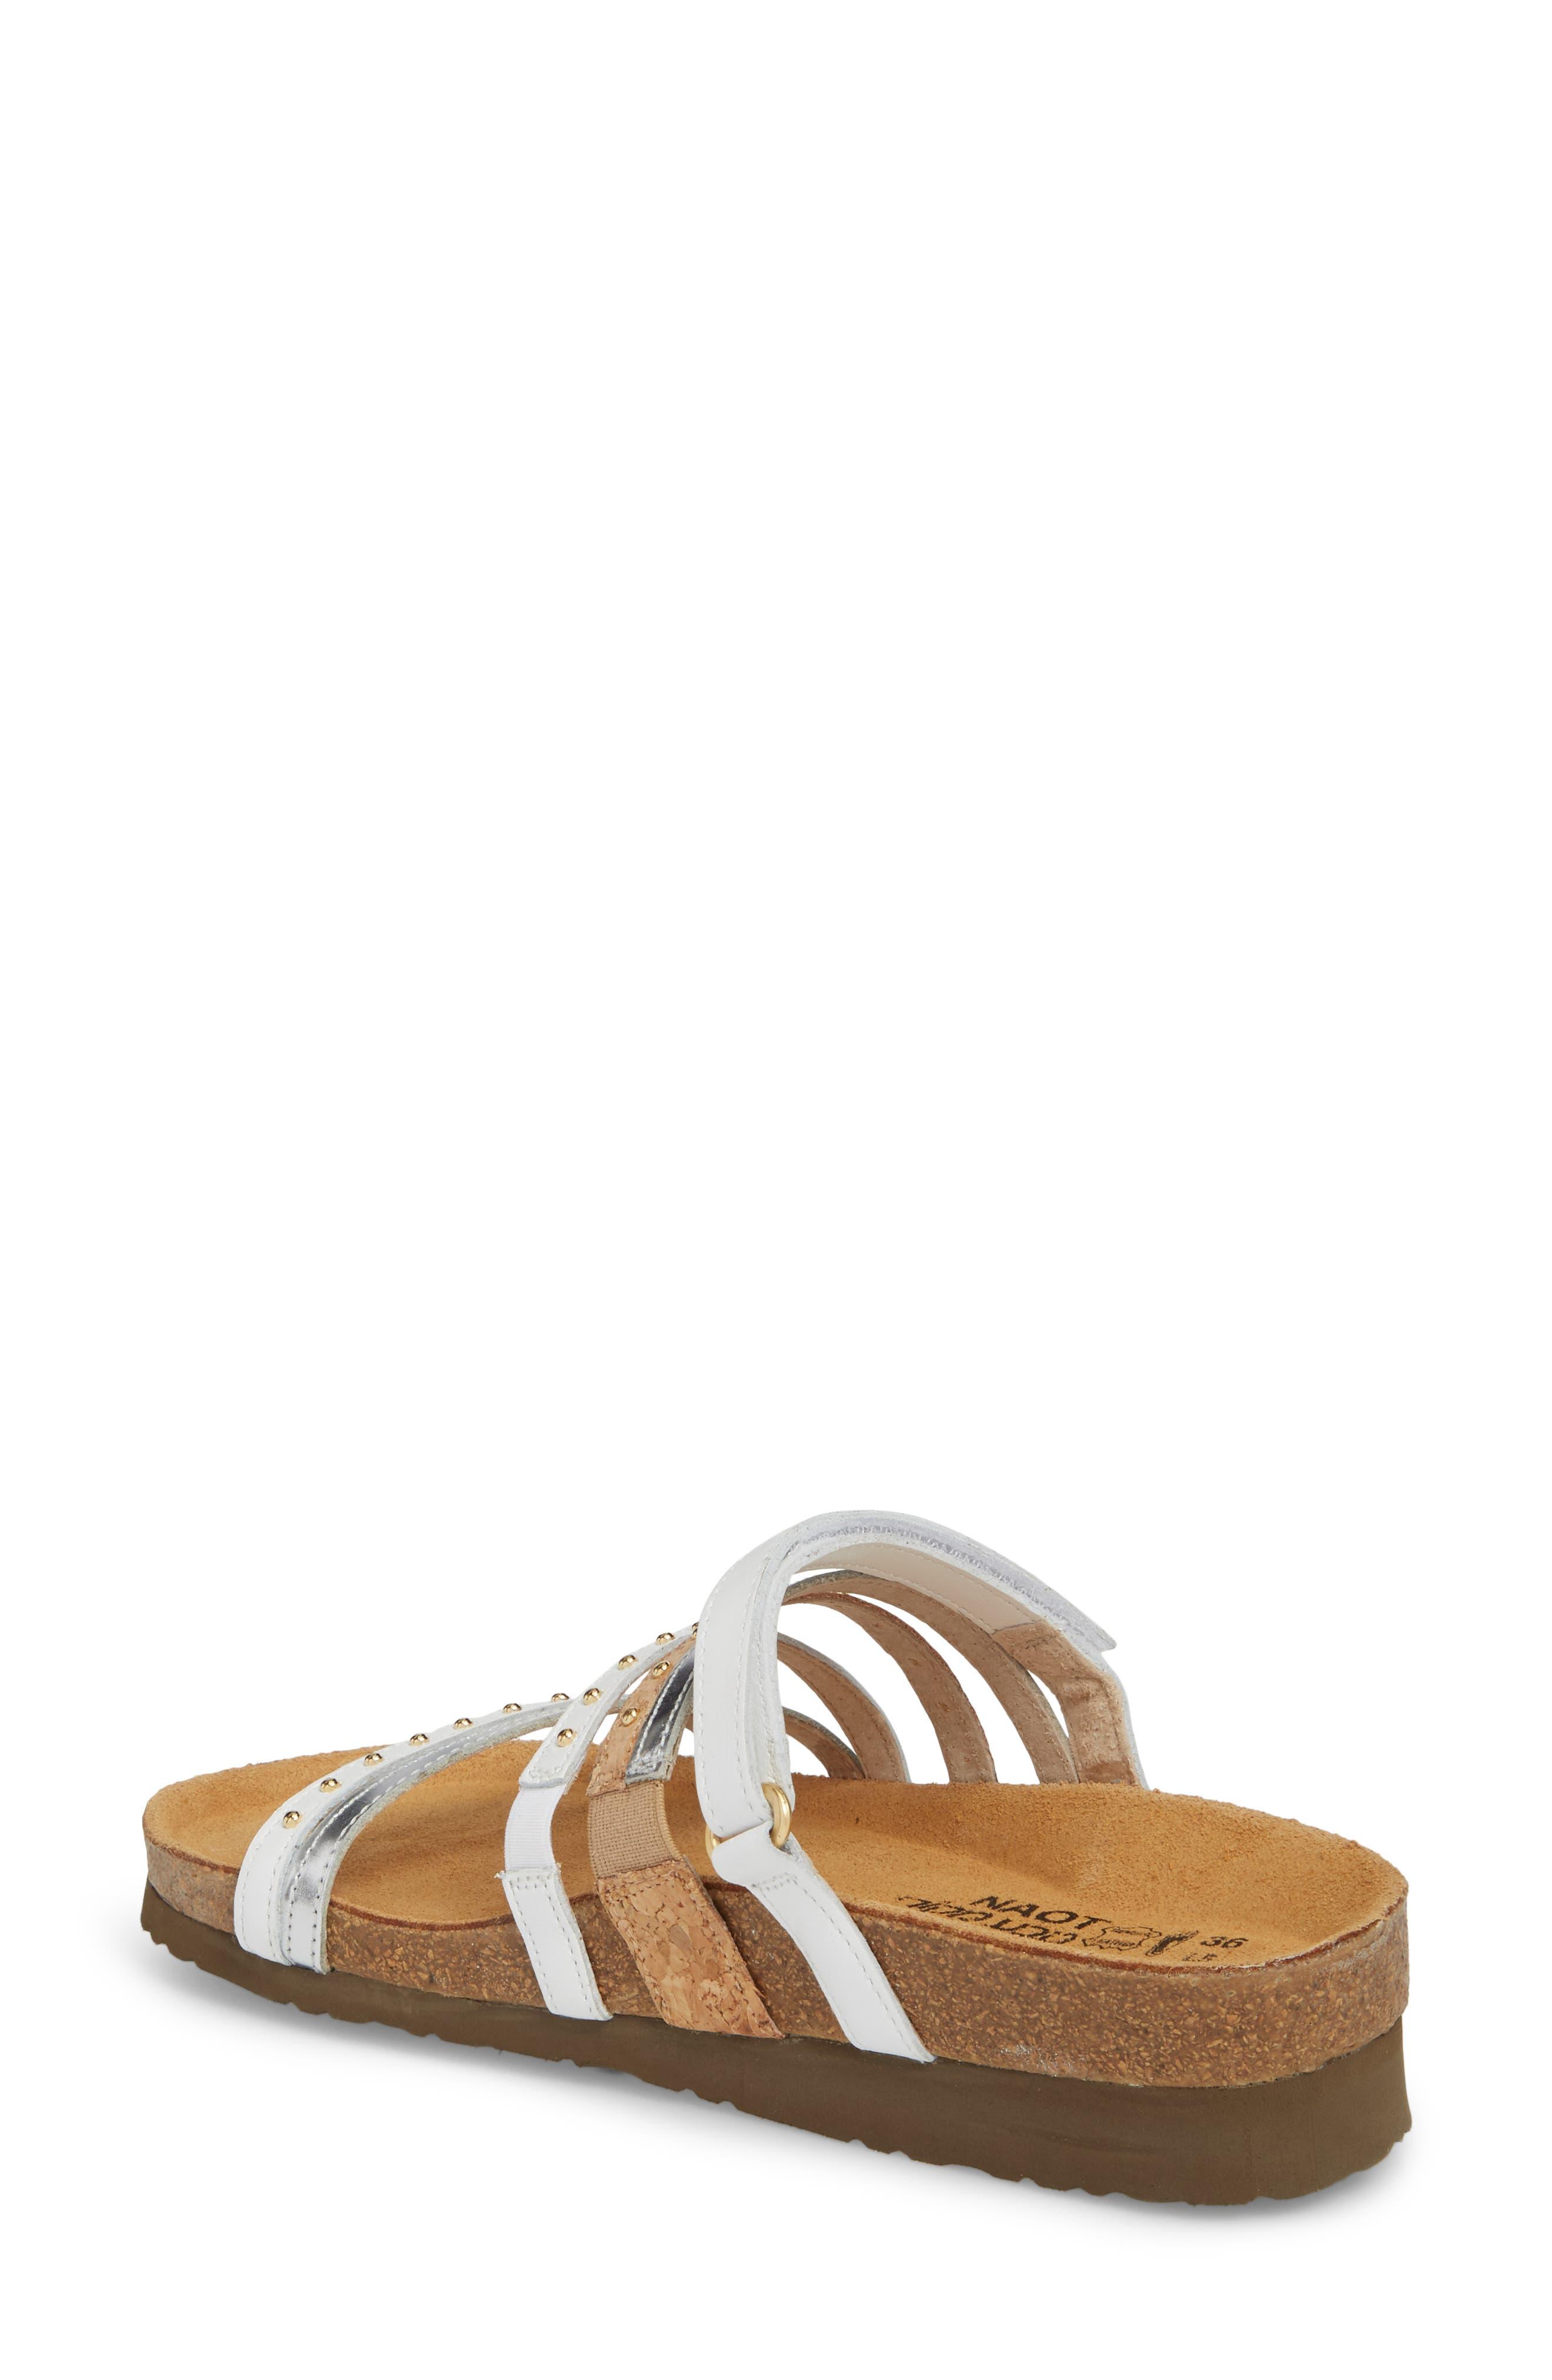 Prescott Sandal,                             Alternate thumbnail 2, color,                             White/ Silver Leather